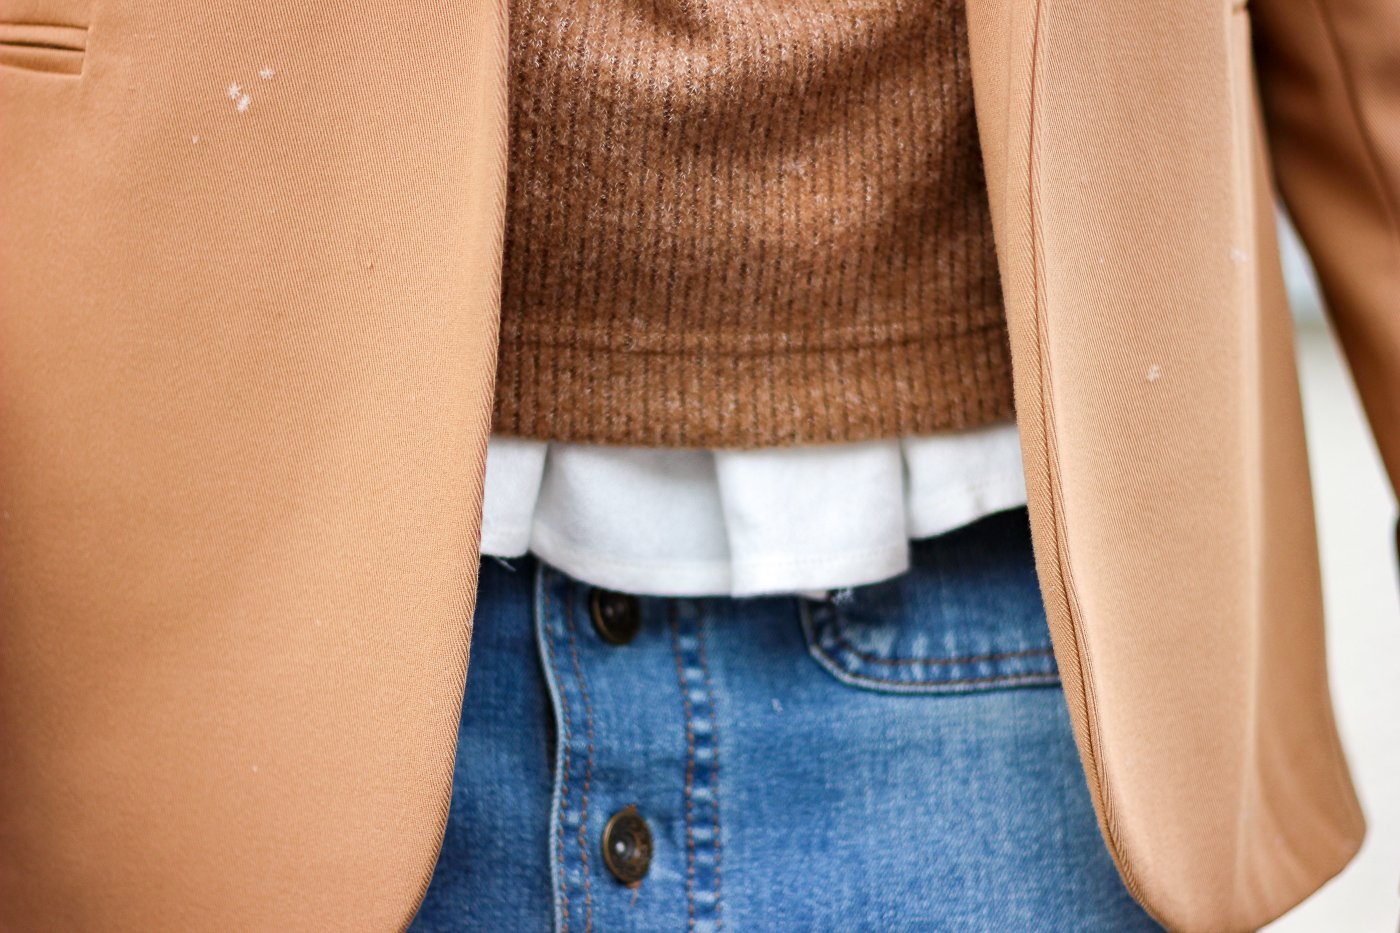 conny doll lifestyle: Winterlook, Details, Jeansrock, Pullunder, Blazer, Cognac